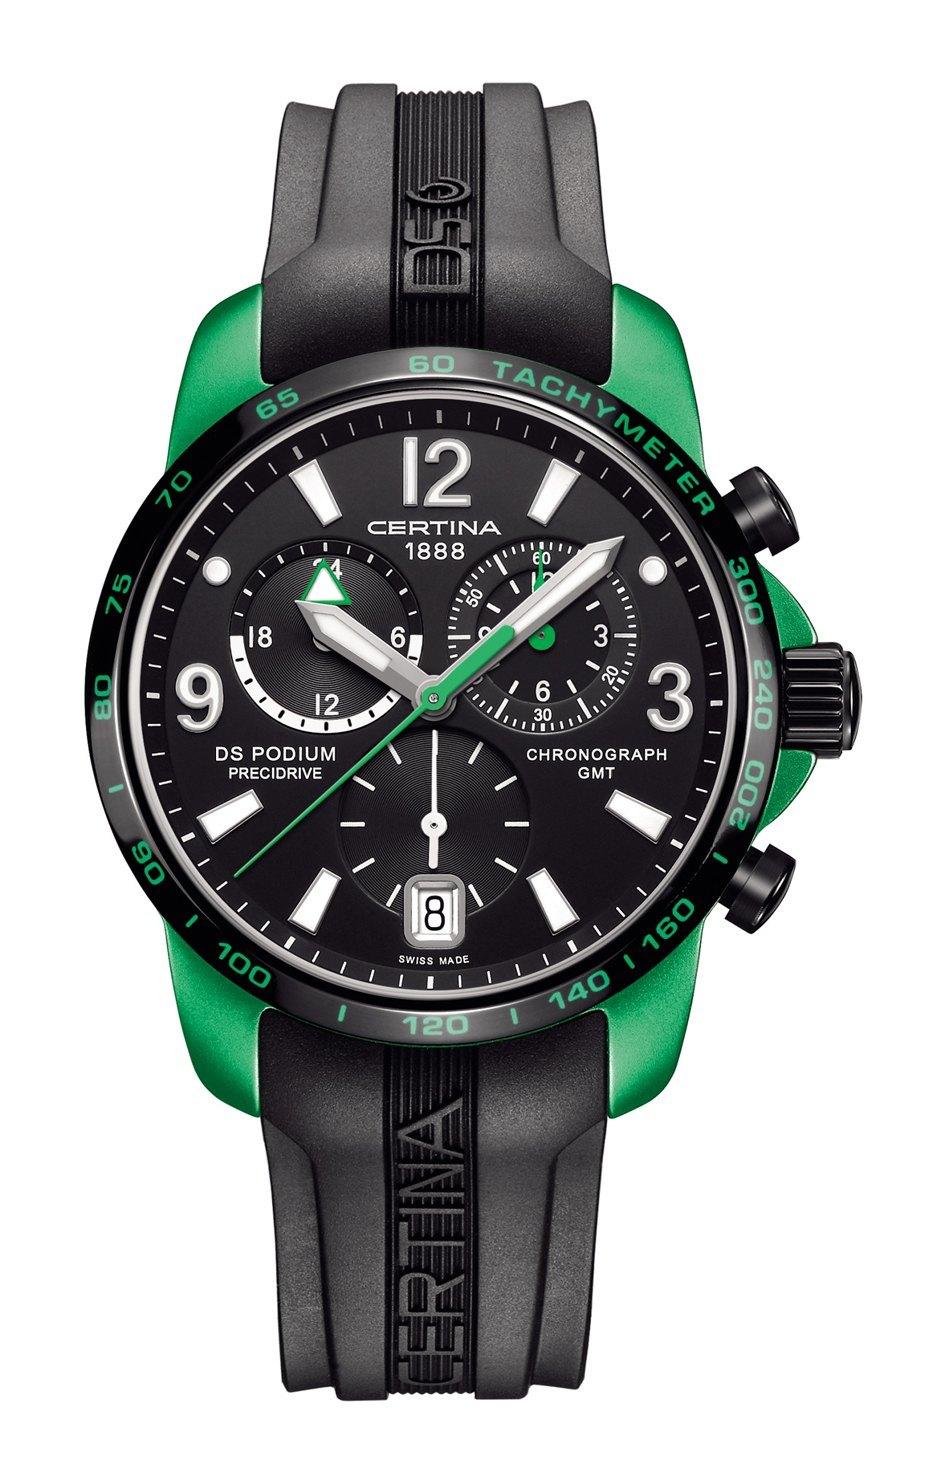 DS PODIUM GMT Chronograph – Aluminium Ligero, luminoso y deliciosamente deportivo